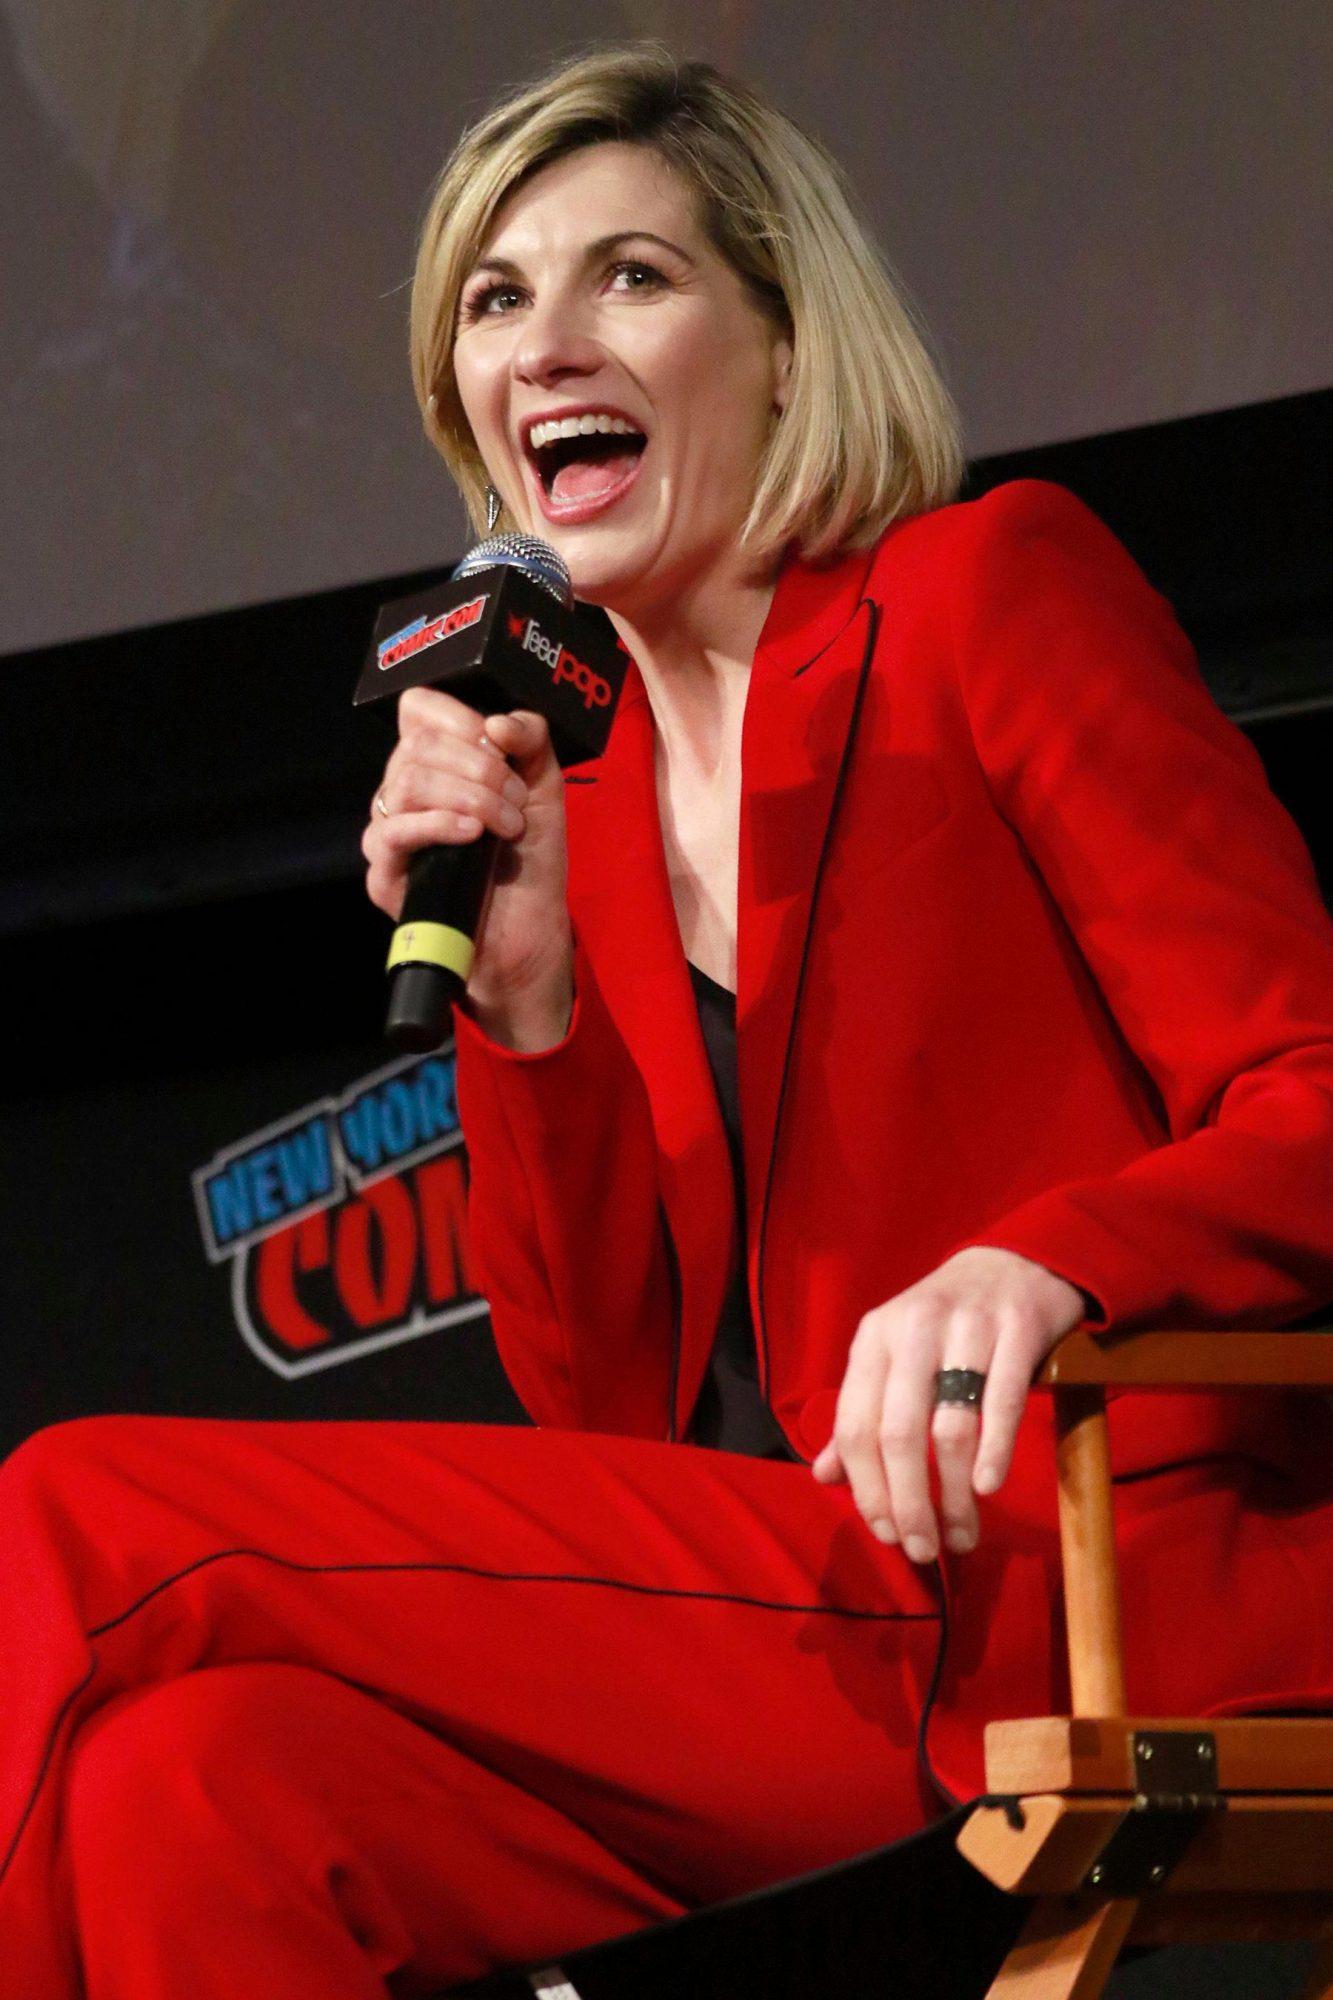 'Doctor Who' TV show panel, New York Comic Con, USA - 07 Oct 2018